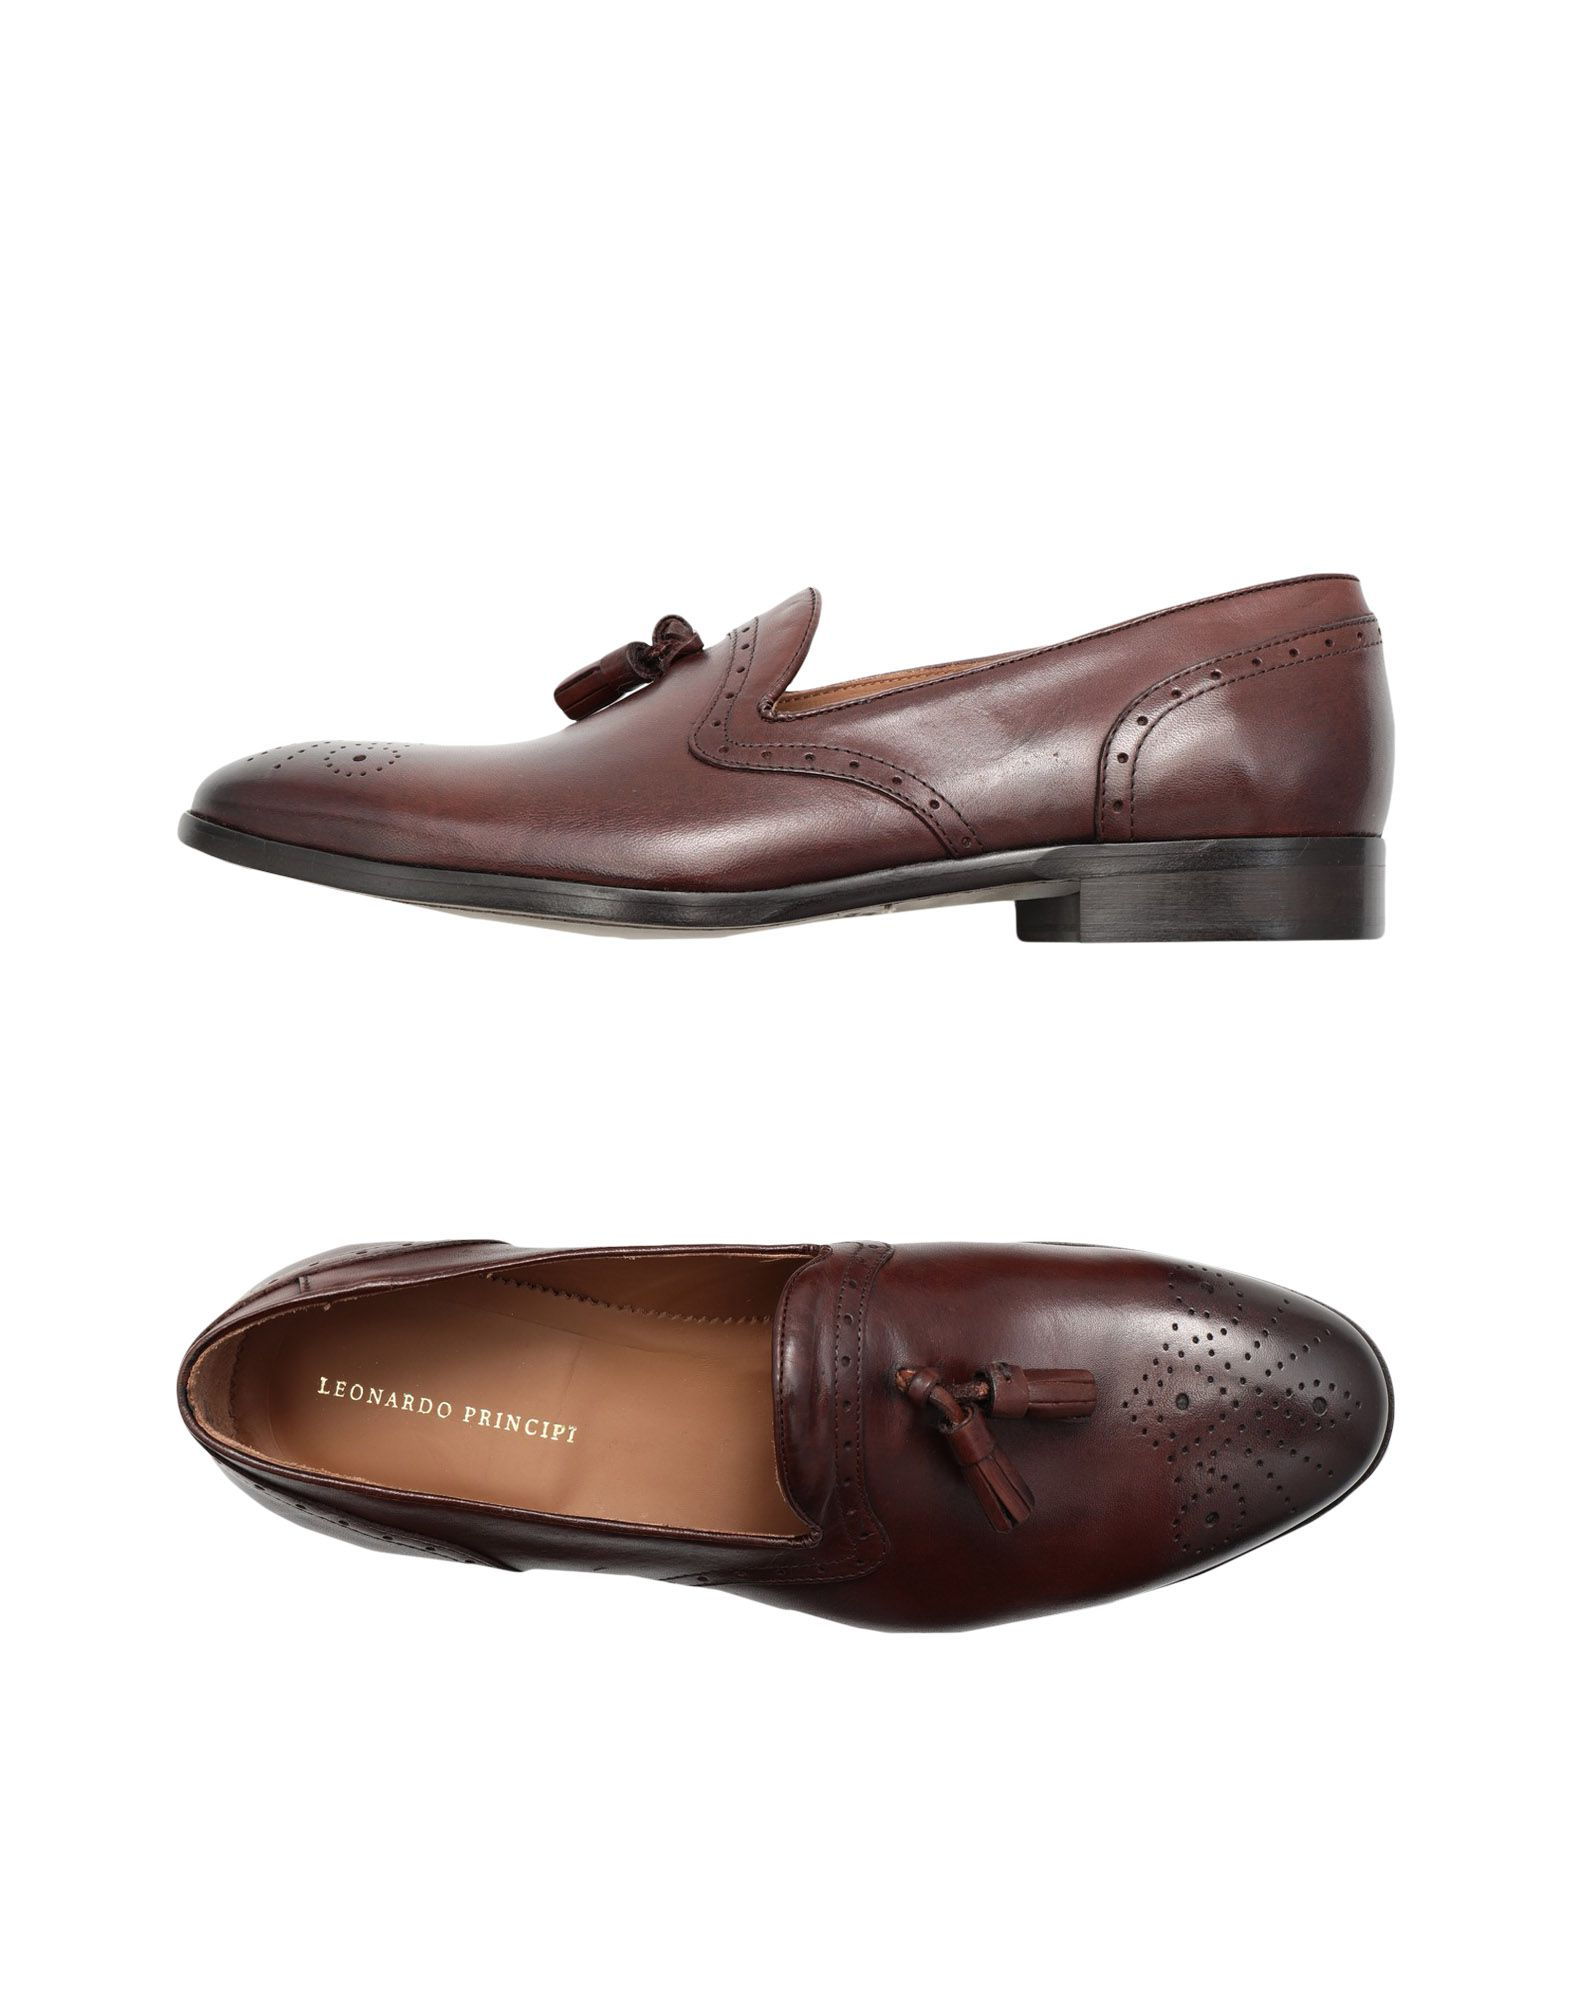 Leonardo Principi Gute Mokassins Herren  11524300EB Gute Principi Qualität beliebte Schuhe 817434